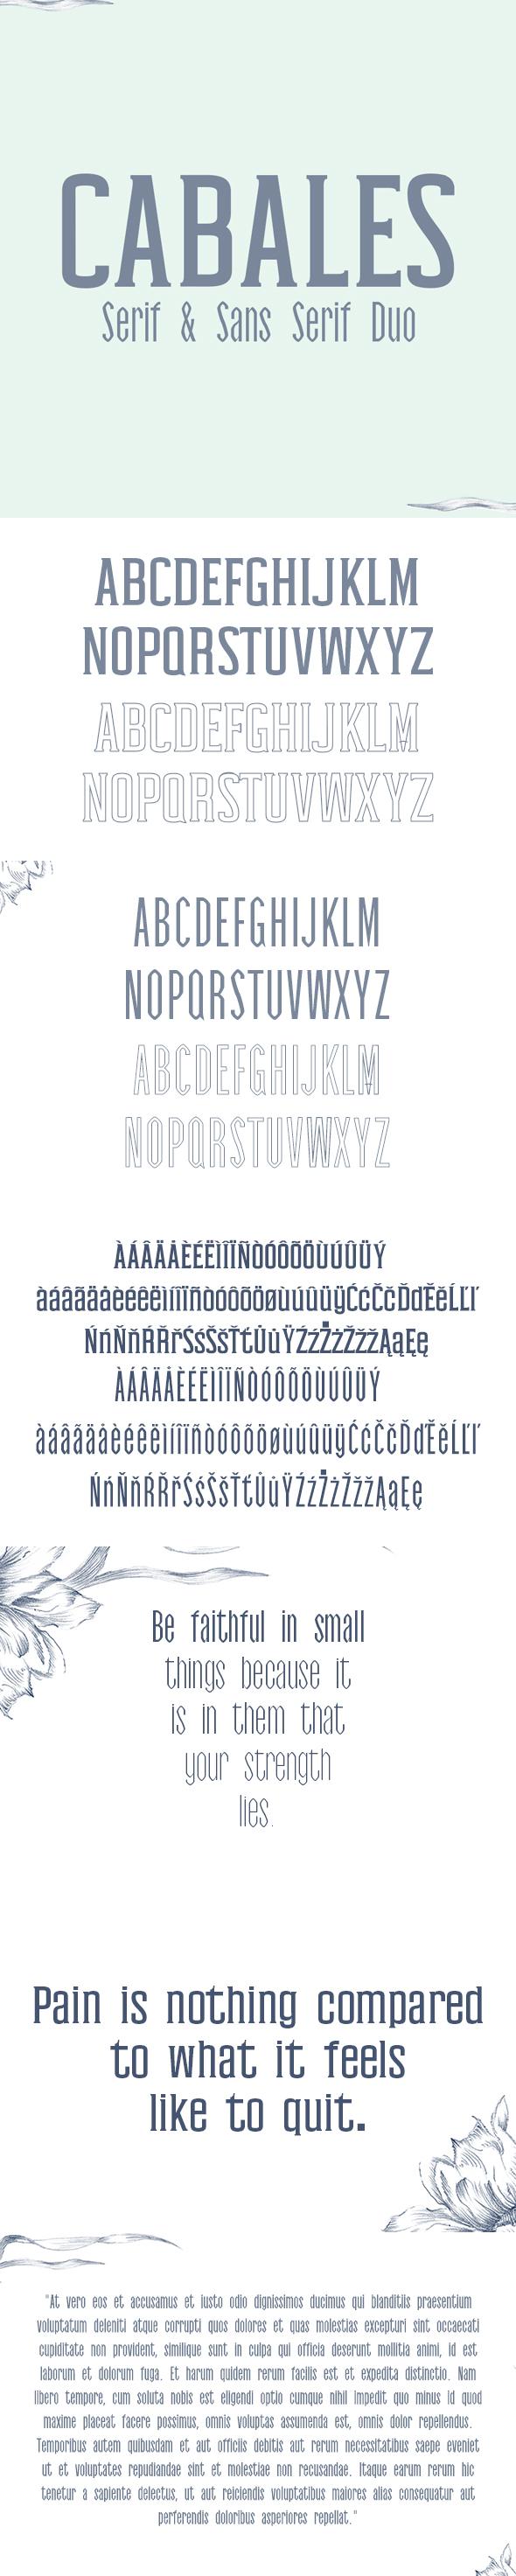 Cabales Duo Font - Sans-Serif Fonts